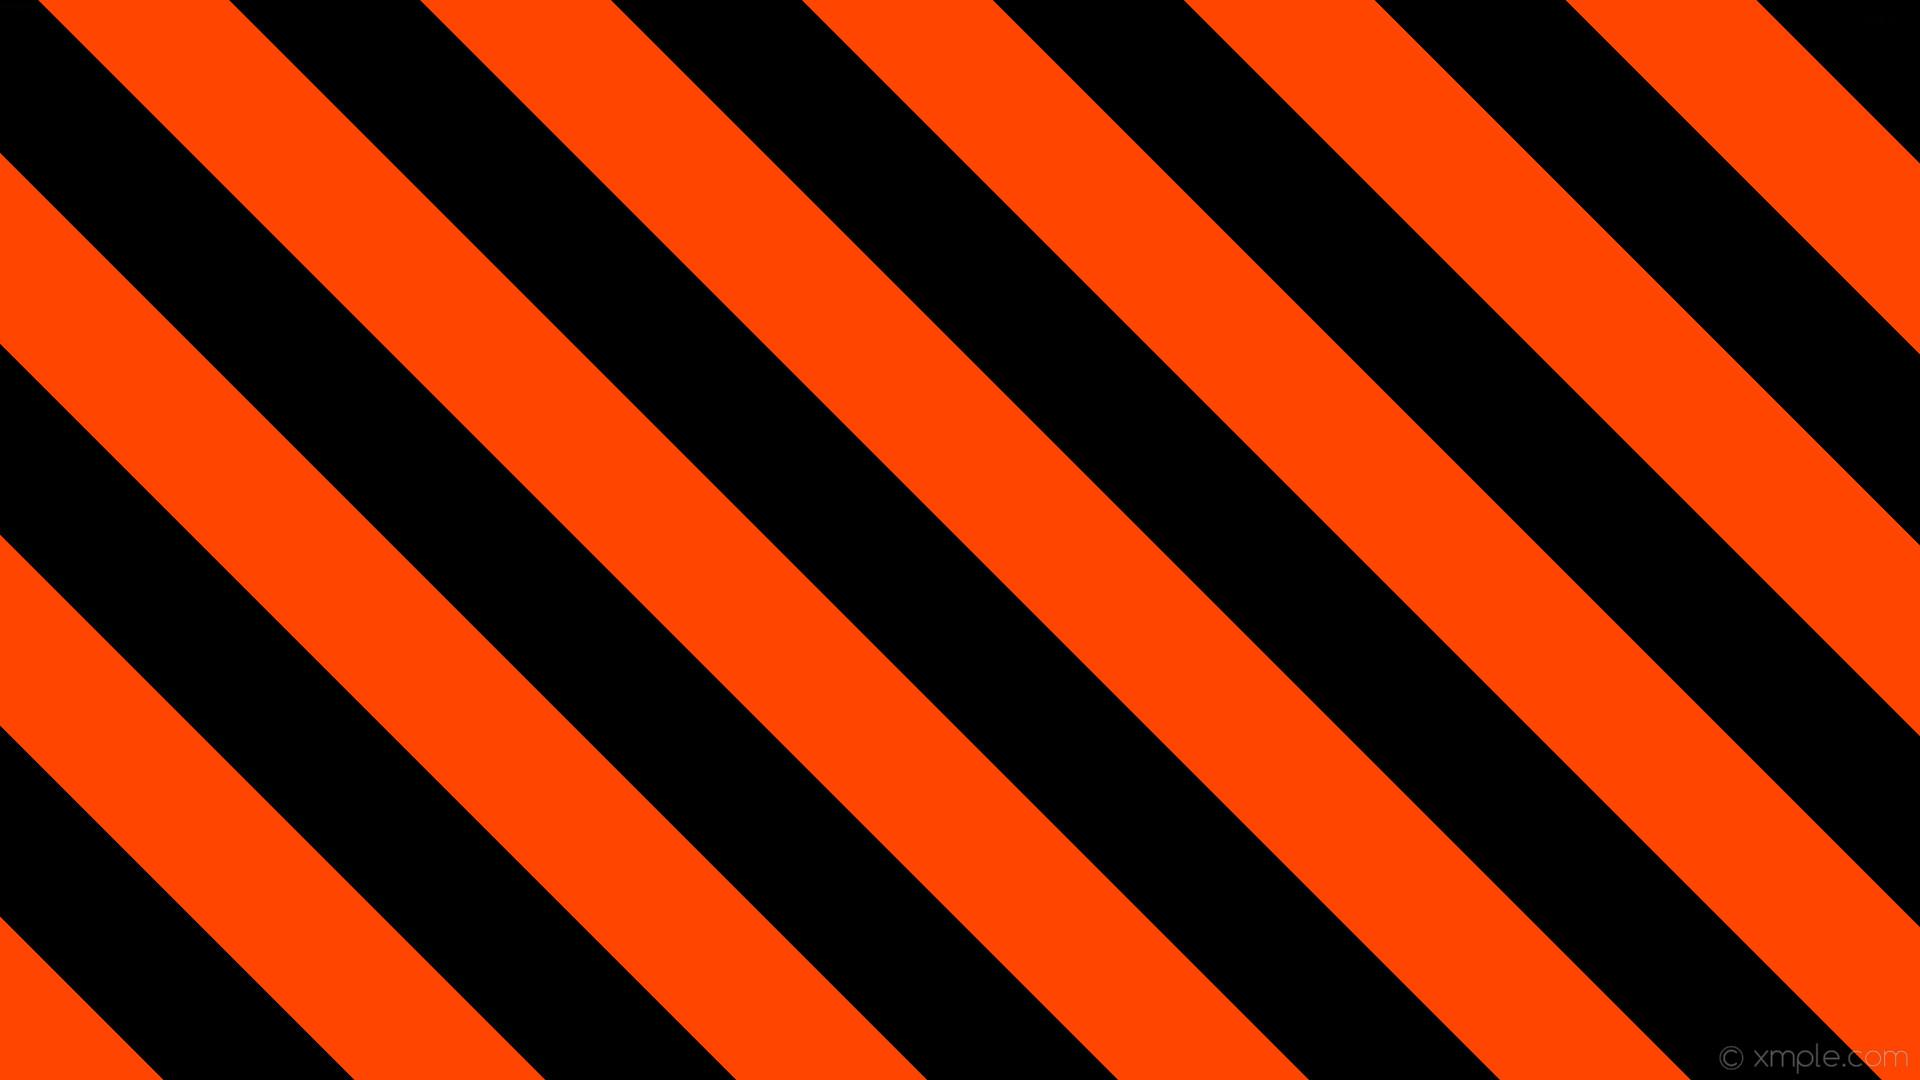 Res: 1920x1080, wallpaper stripes orange black lines streaks orangered #000000 #ff4500  diagonal 315° 135px